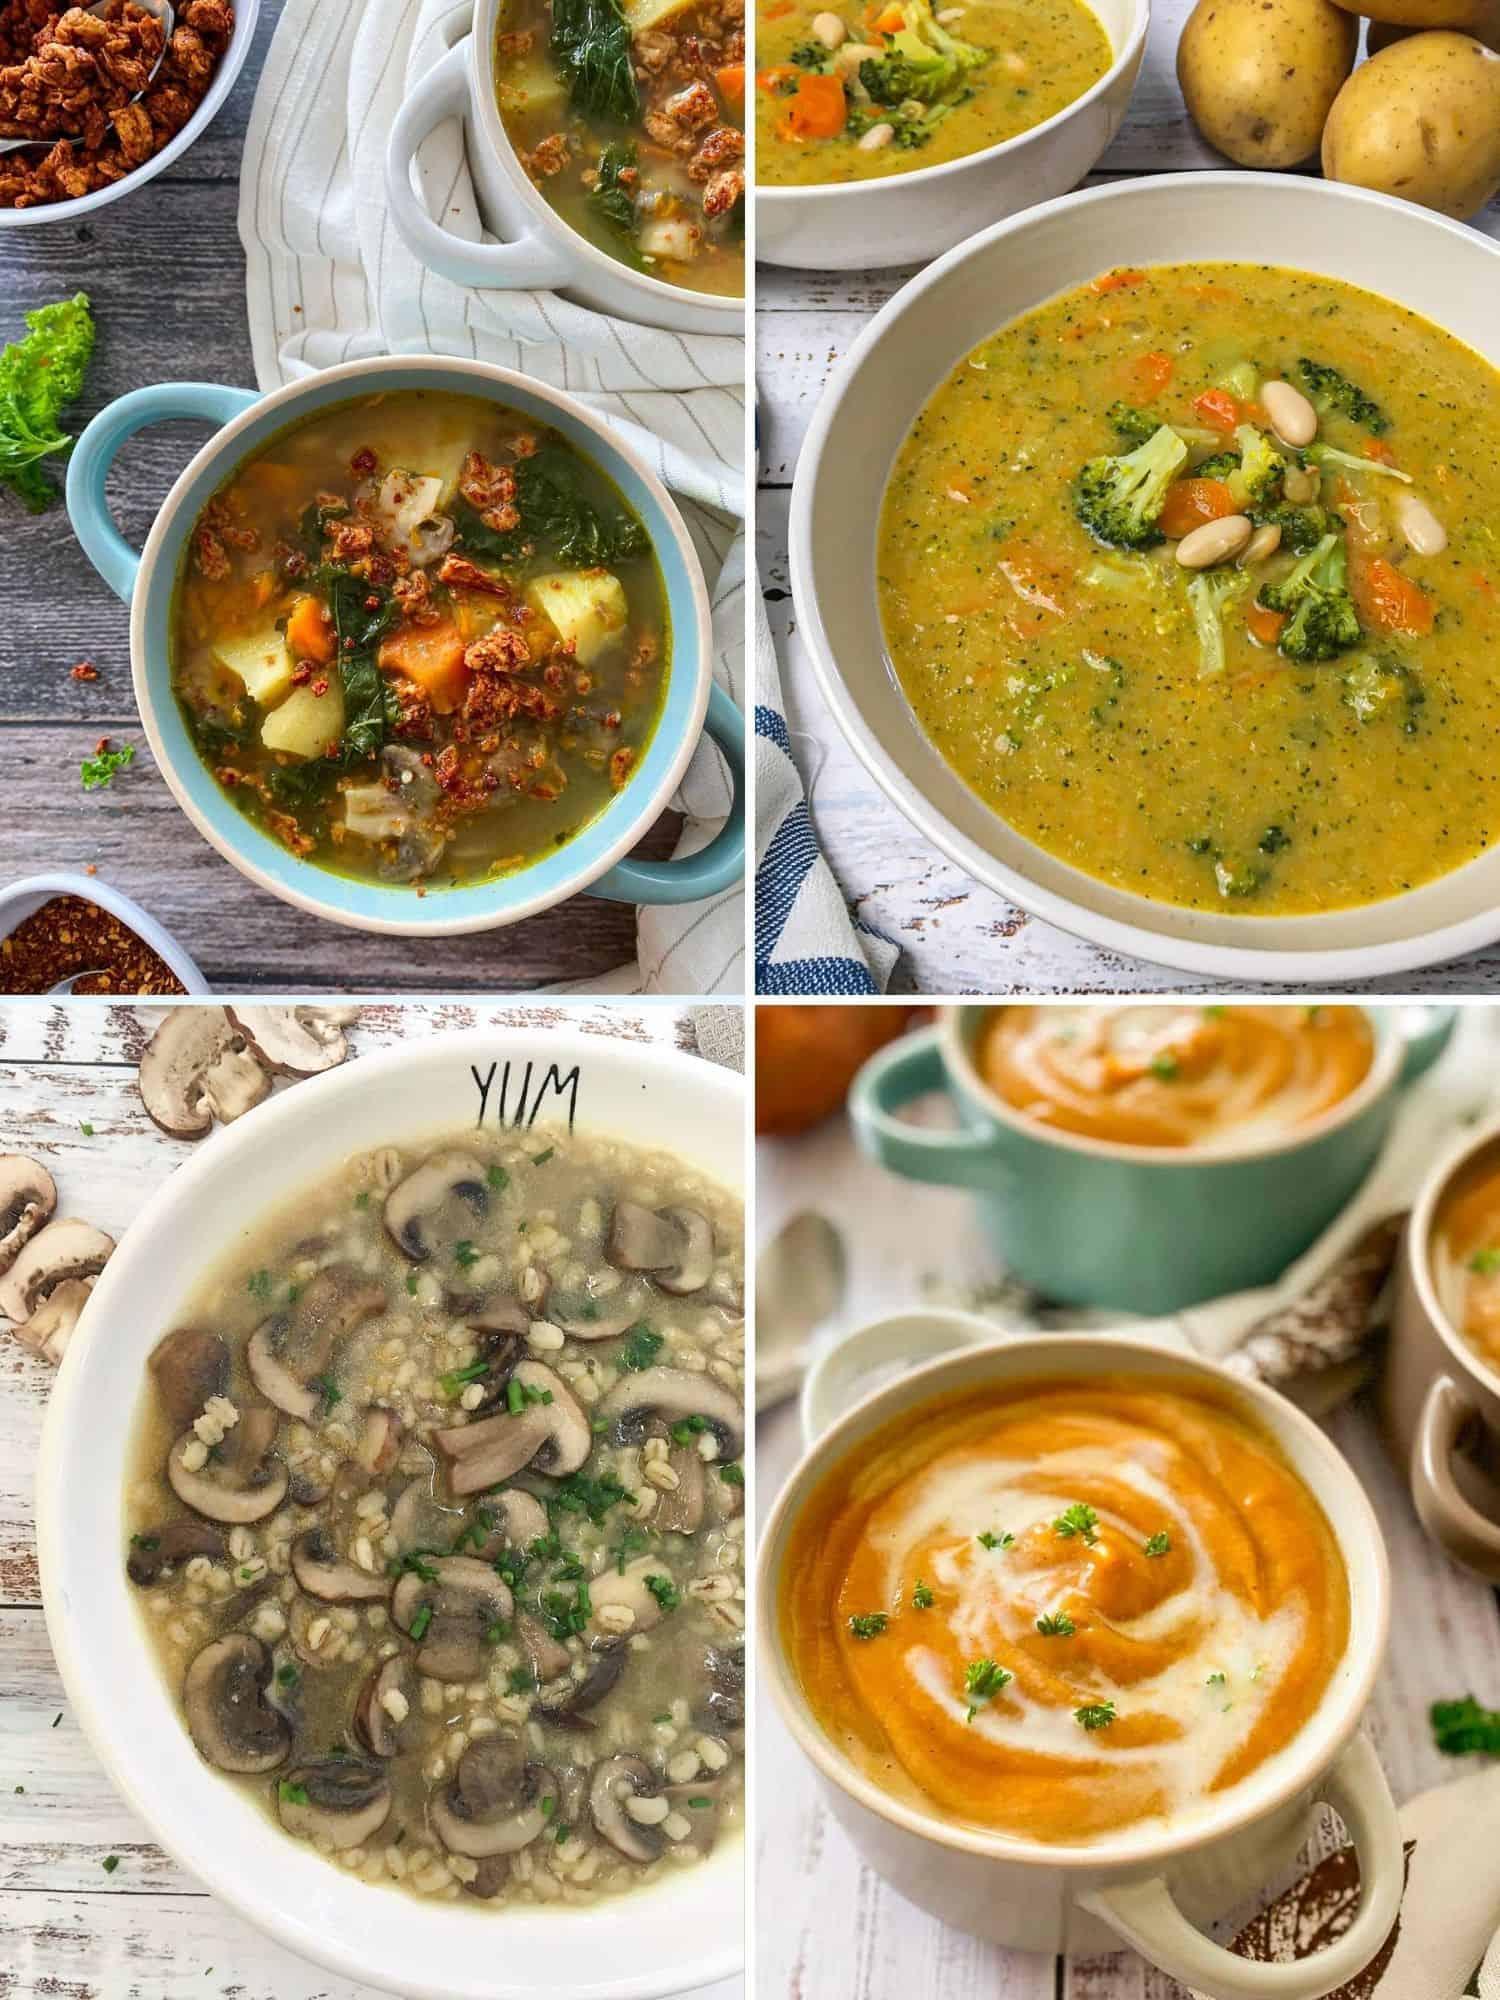 Collage of vegan soup recipes: zuppa toscana, broccoli soup, mushroom, sweet potato.